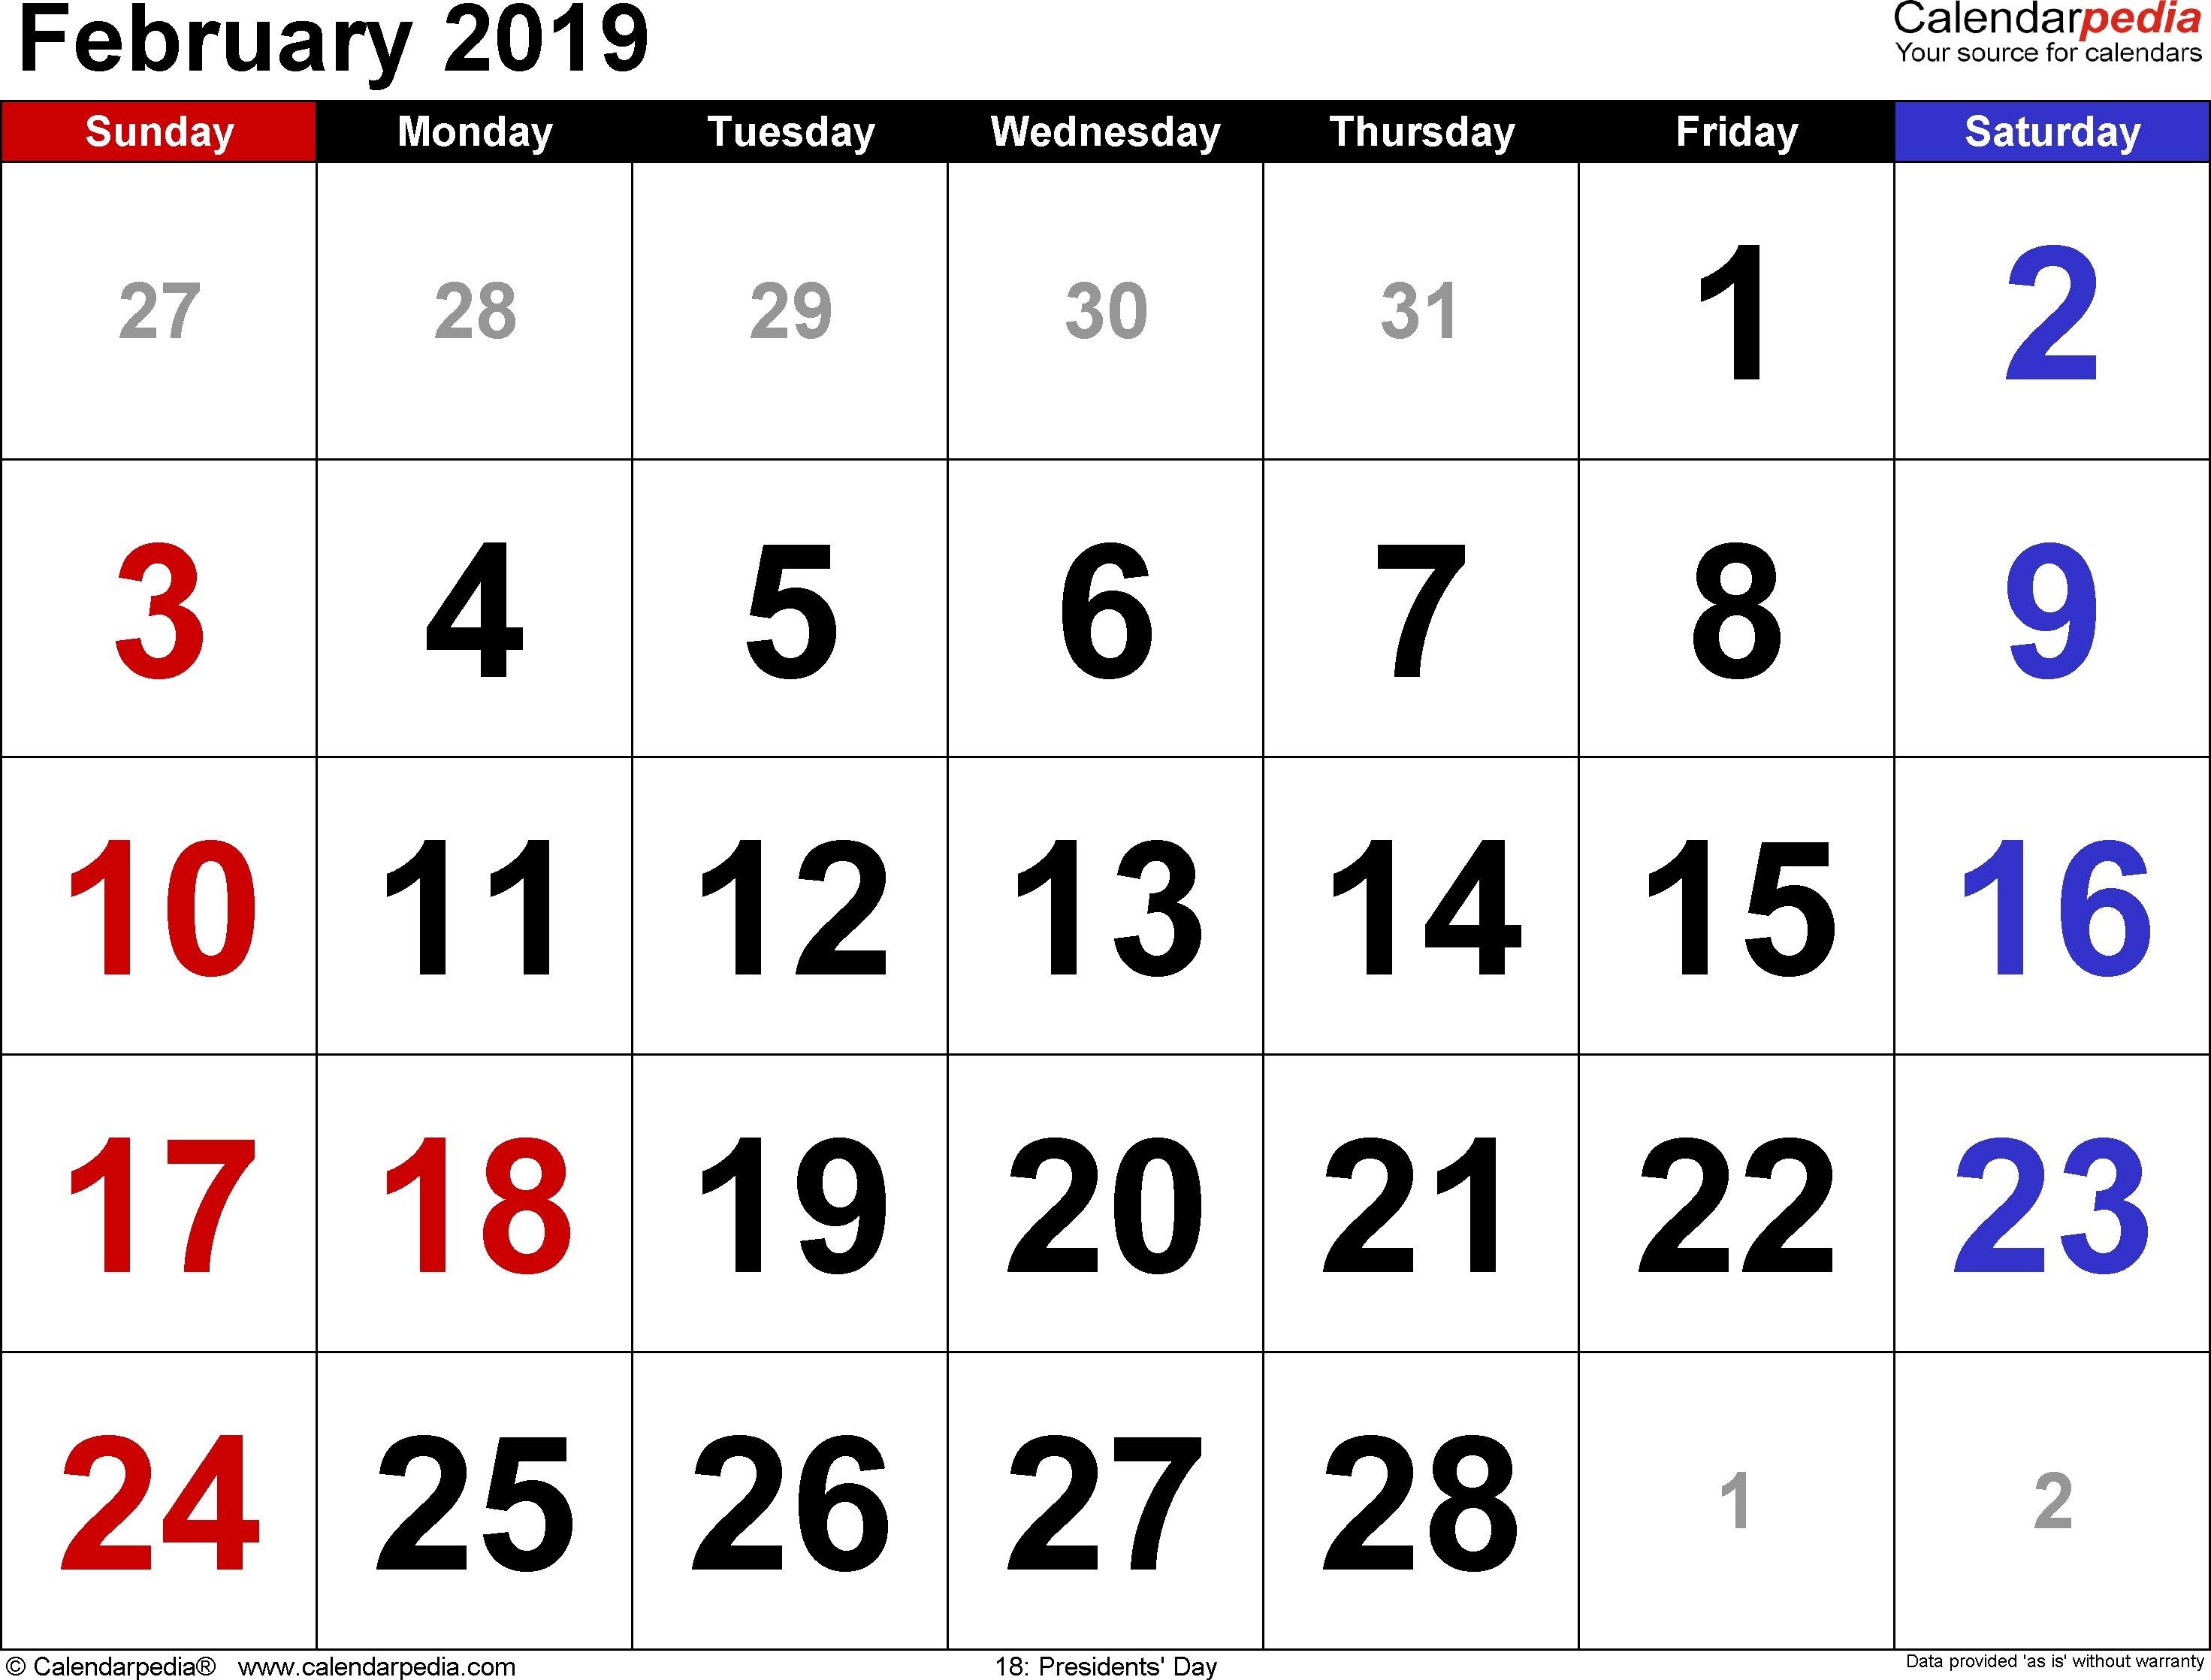 February 2019 Calendar Template | Year Printable Calendar Calendar 2019 Qu